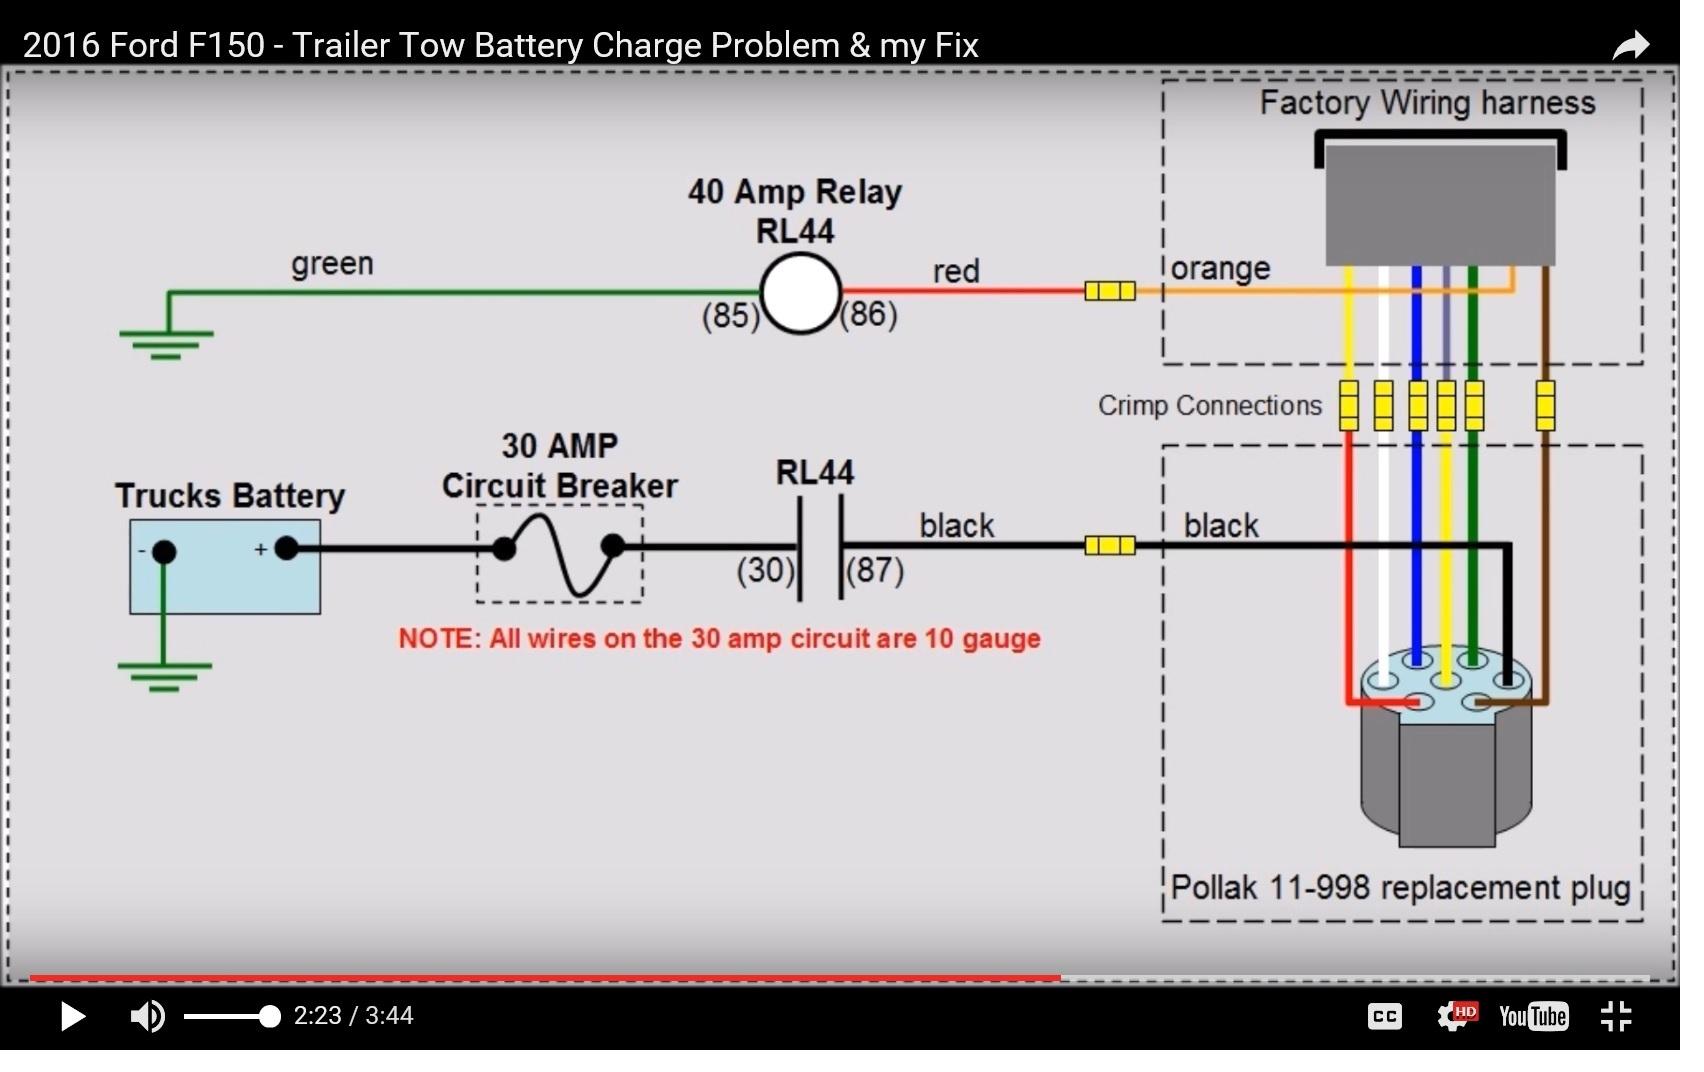 7 Pin To 4 Pin Trailer Wiring Diagram   Manual E-Books - 7 Pin To 4 Pin Trailer Wiring Diagram